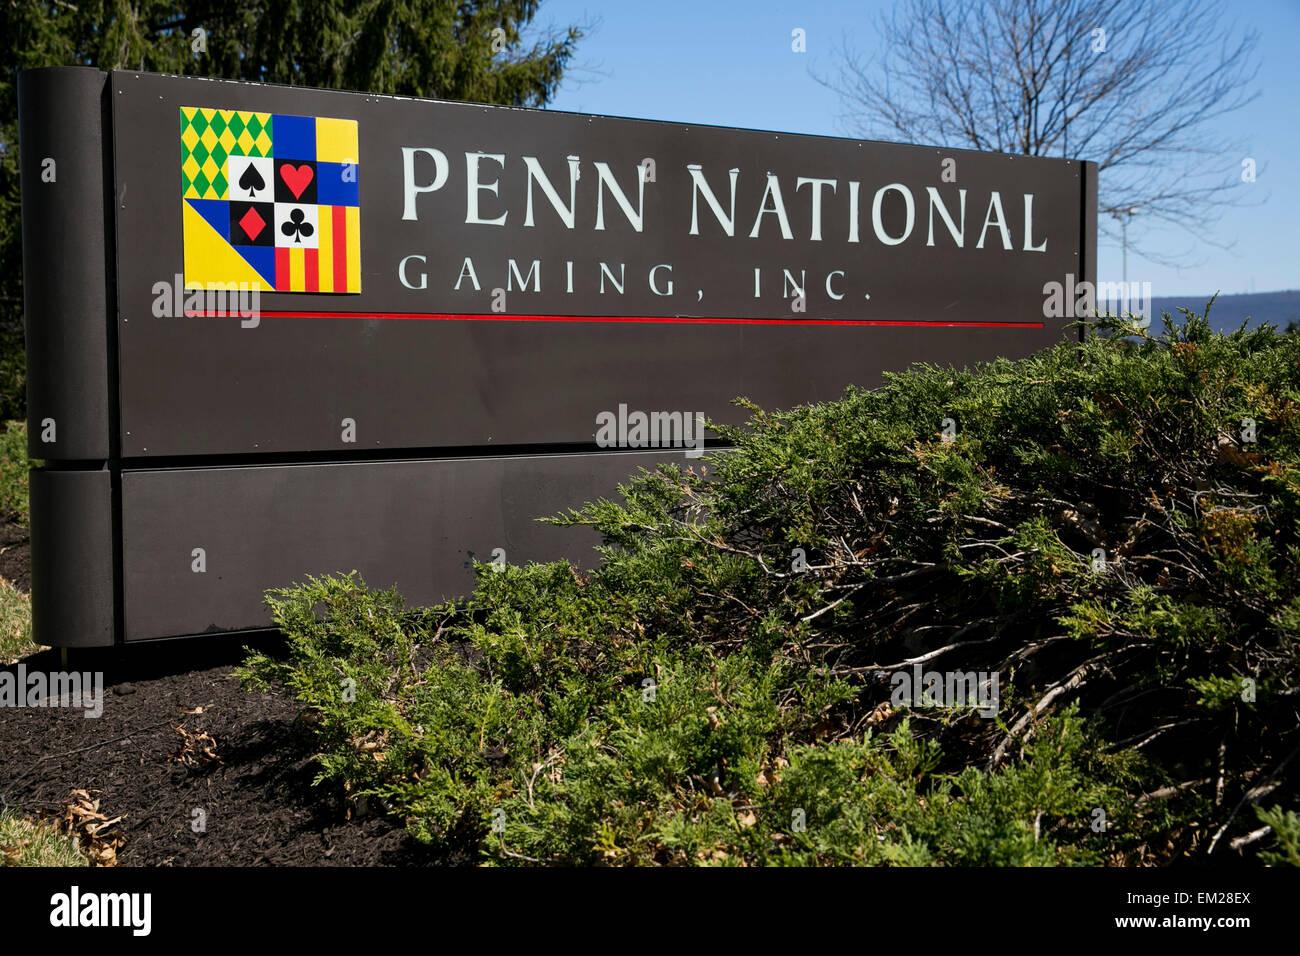 Un logotipo firmar fuera de la sede de Penn National Gaming, Inc., en Wyomissing, Pennsylvania. Imagen De Stock